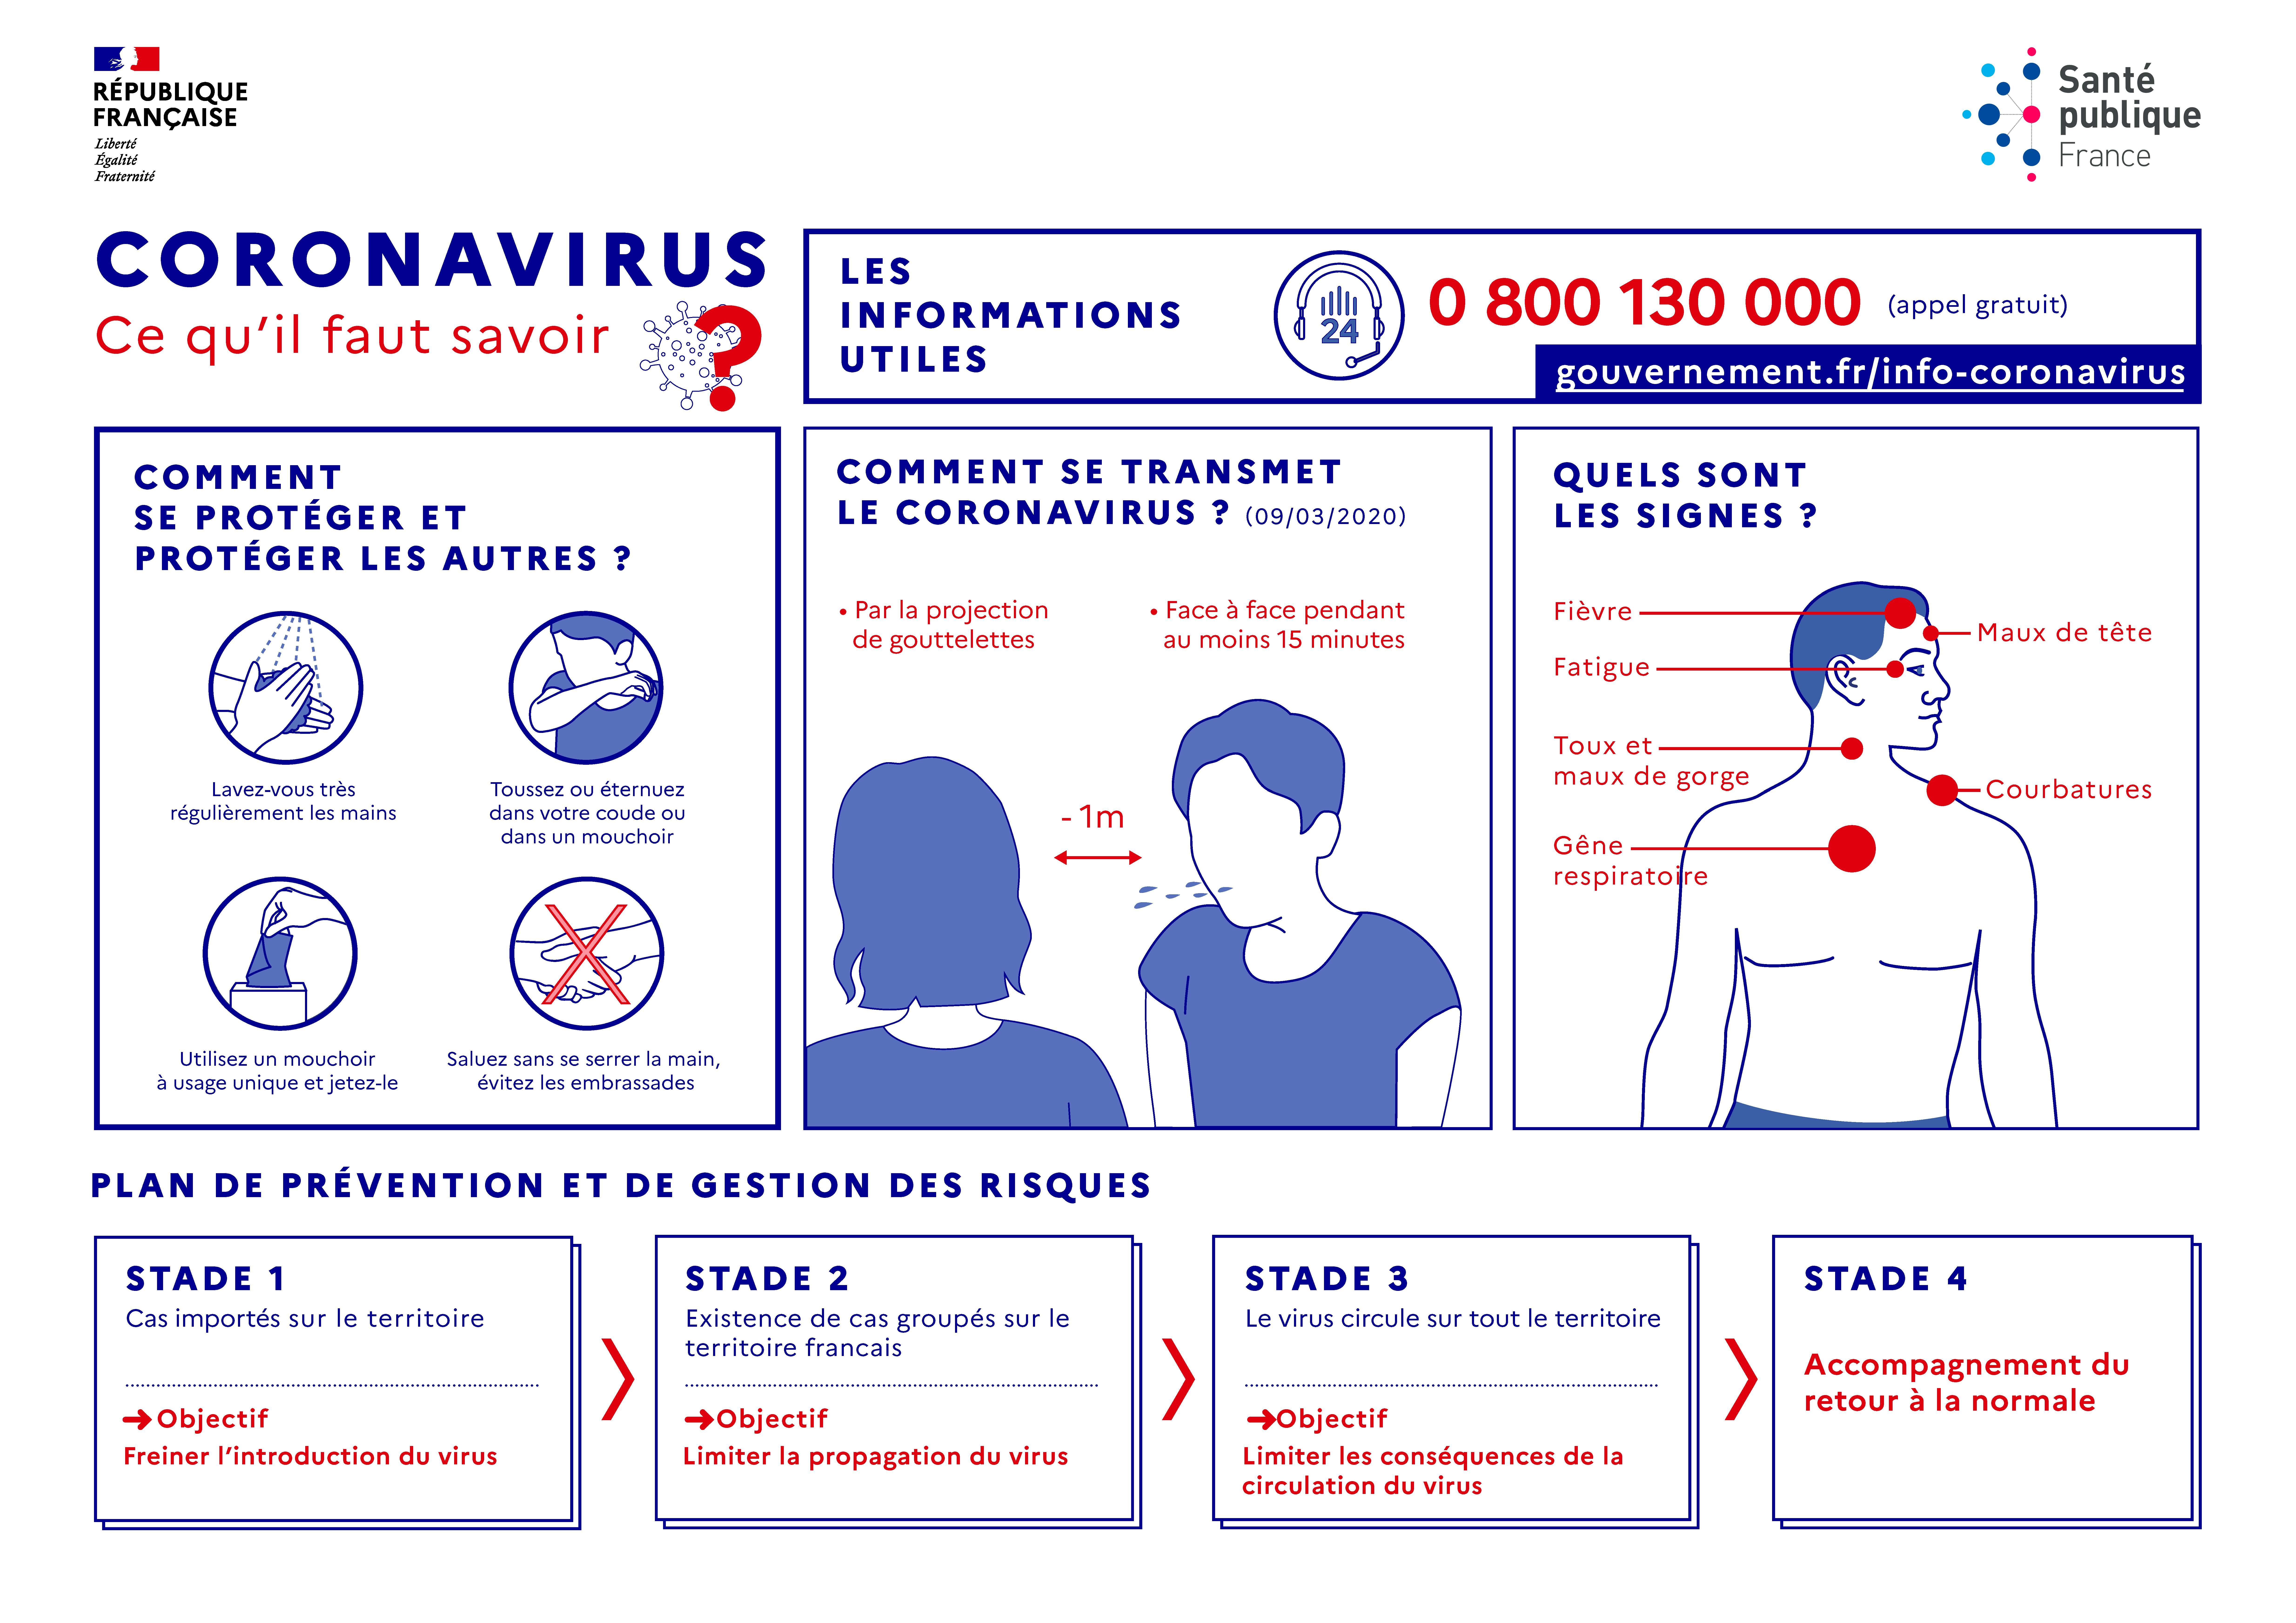 CORONAVIRUS : LES INFORMATIONS UTILES